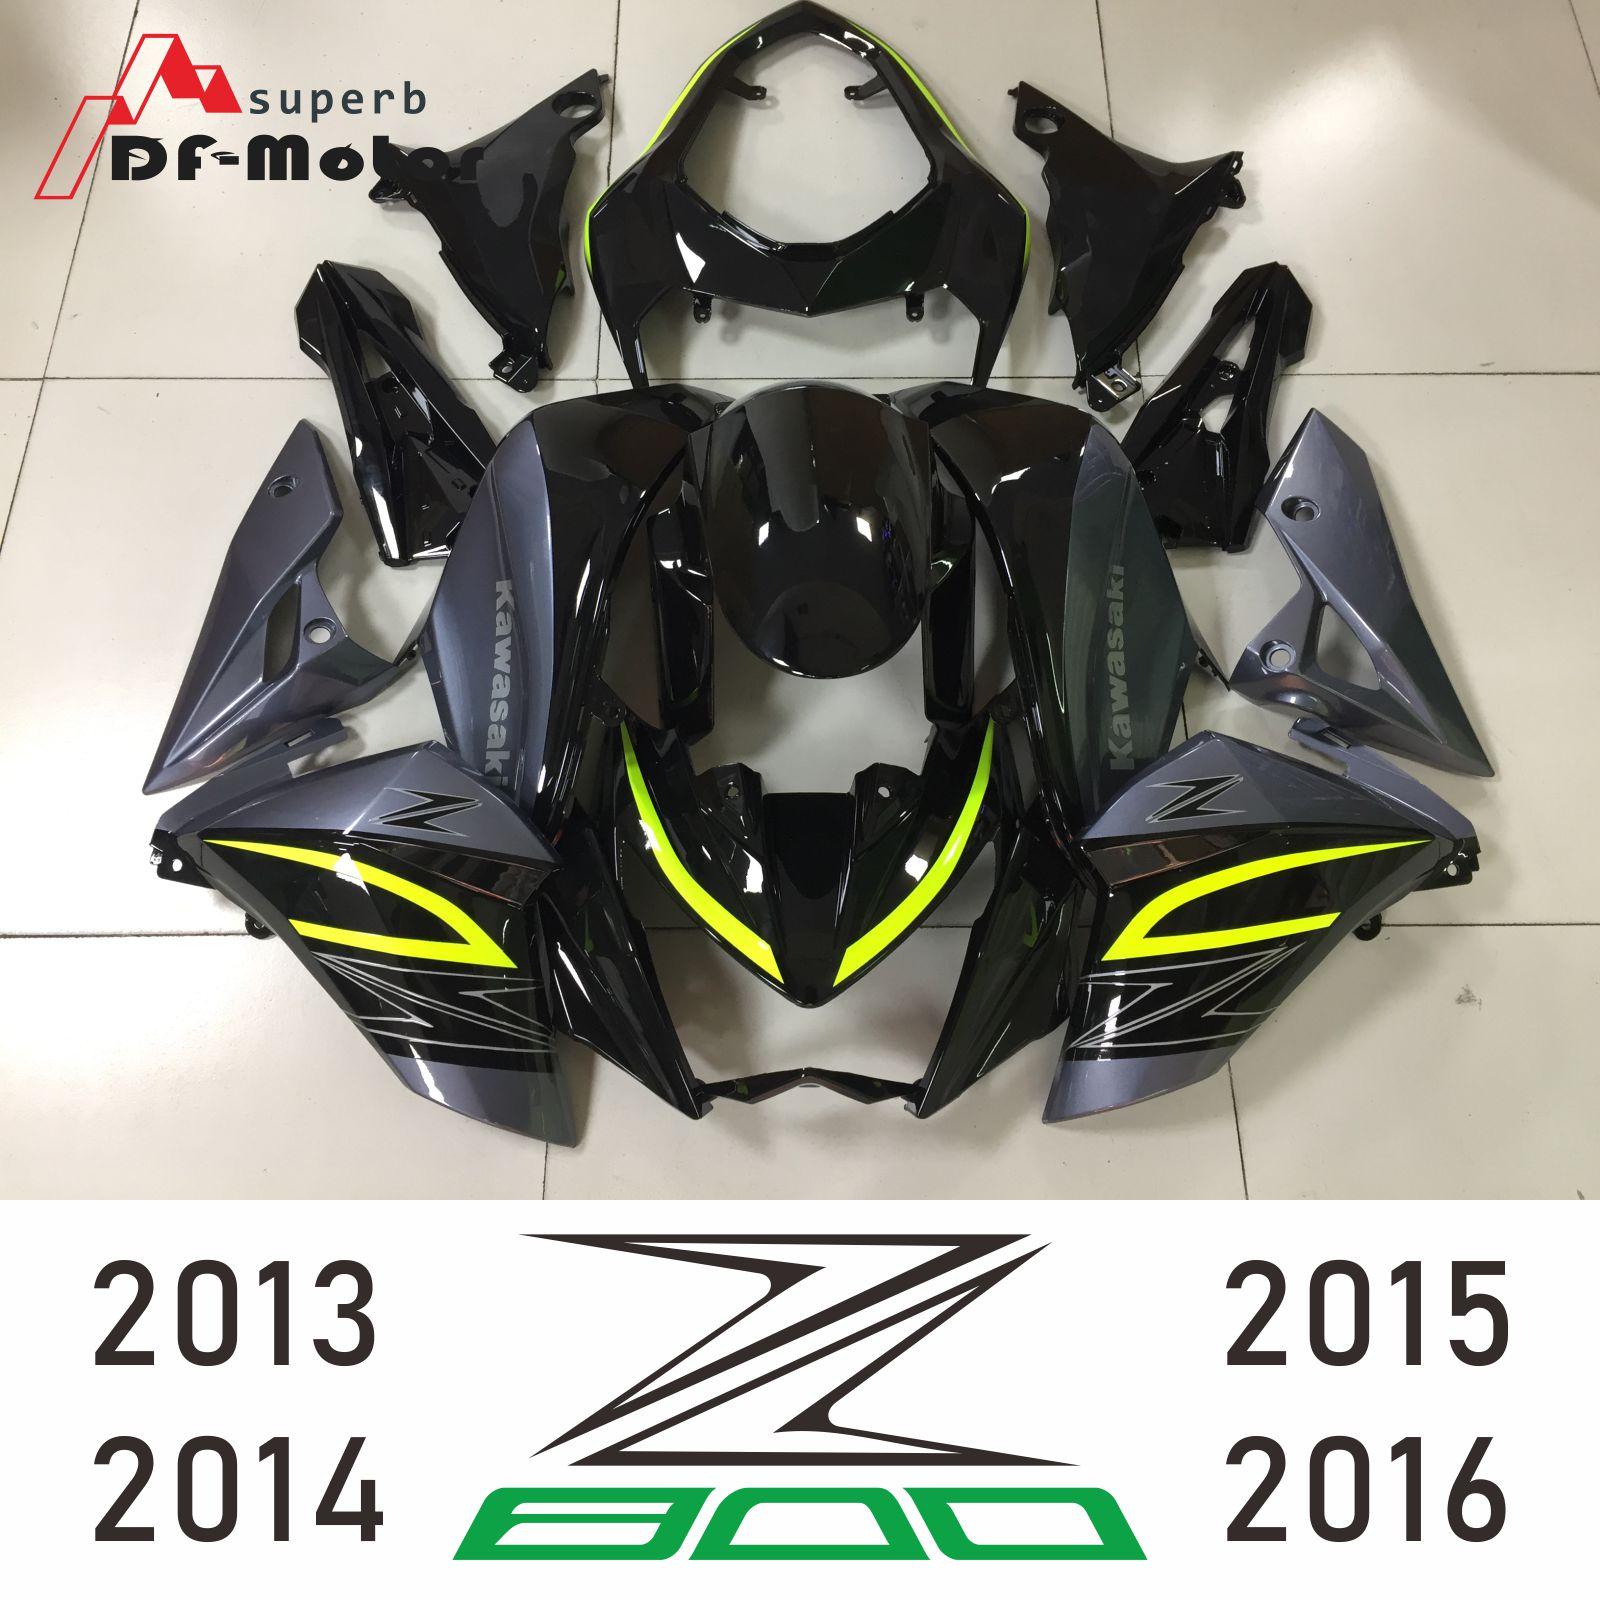 For Kawasaki Z800 2013 2014 2015 2016 Z-800 13 14 15 16 Bodyworks Aftermarket Motorcycle Fairing (Injection Molding)